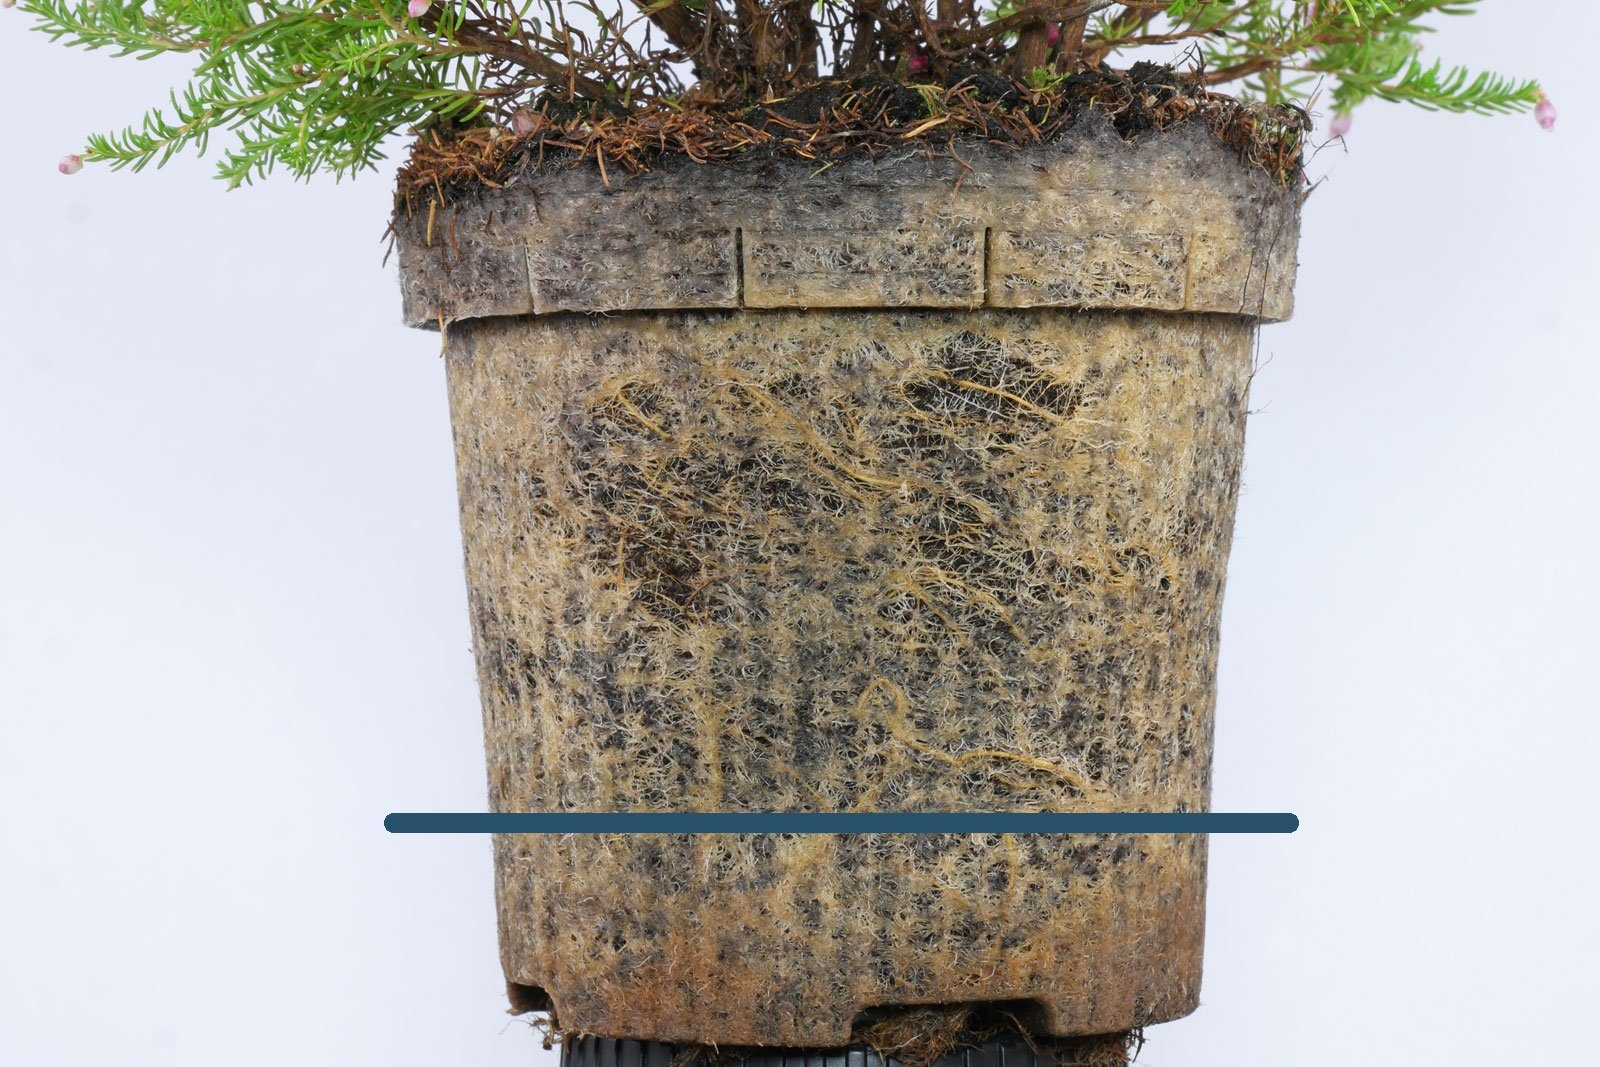 Erica gracilis Wurzeln